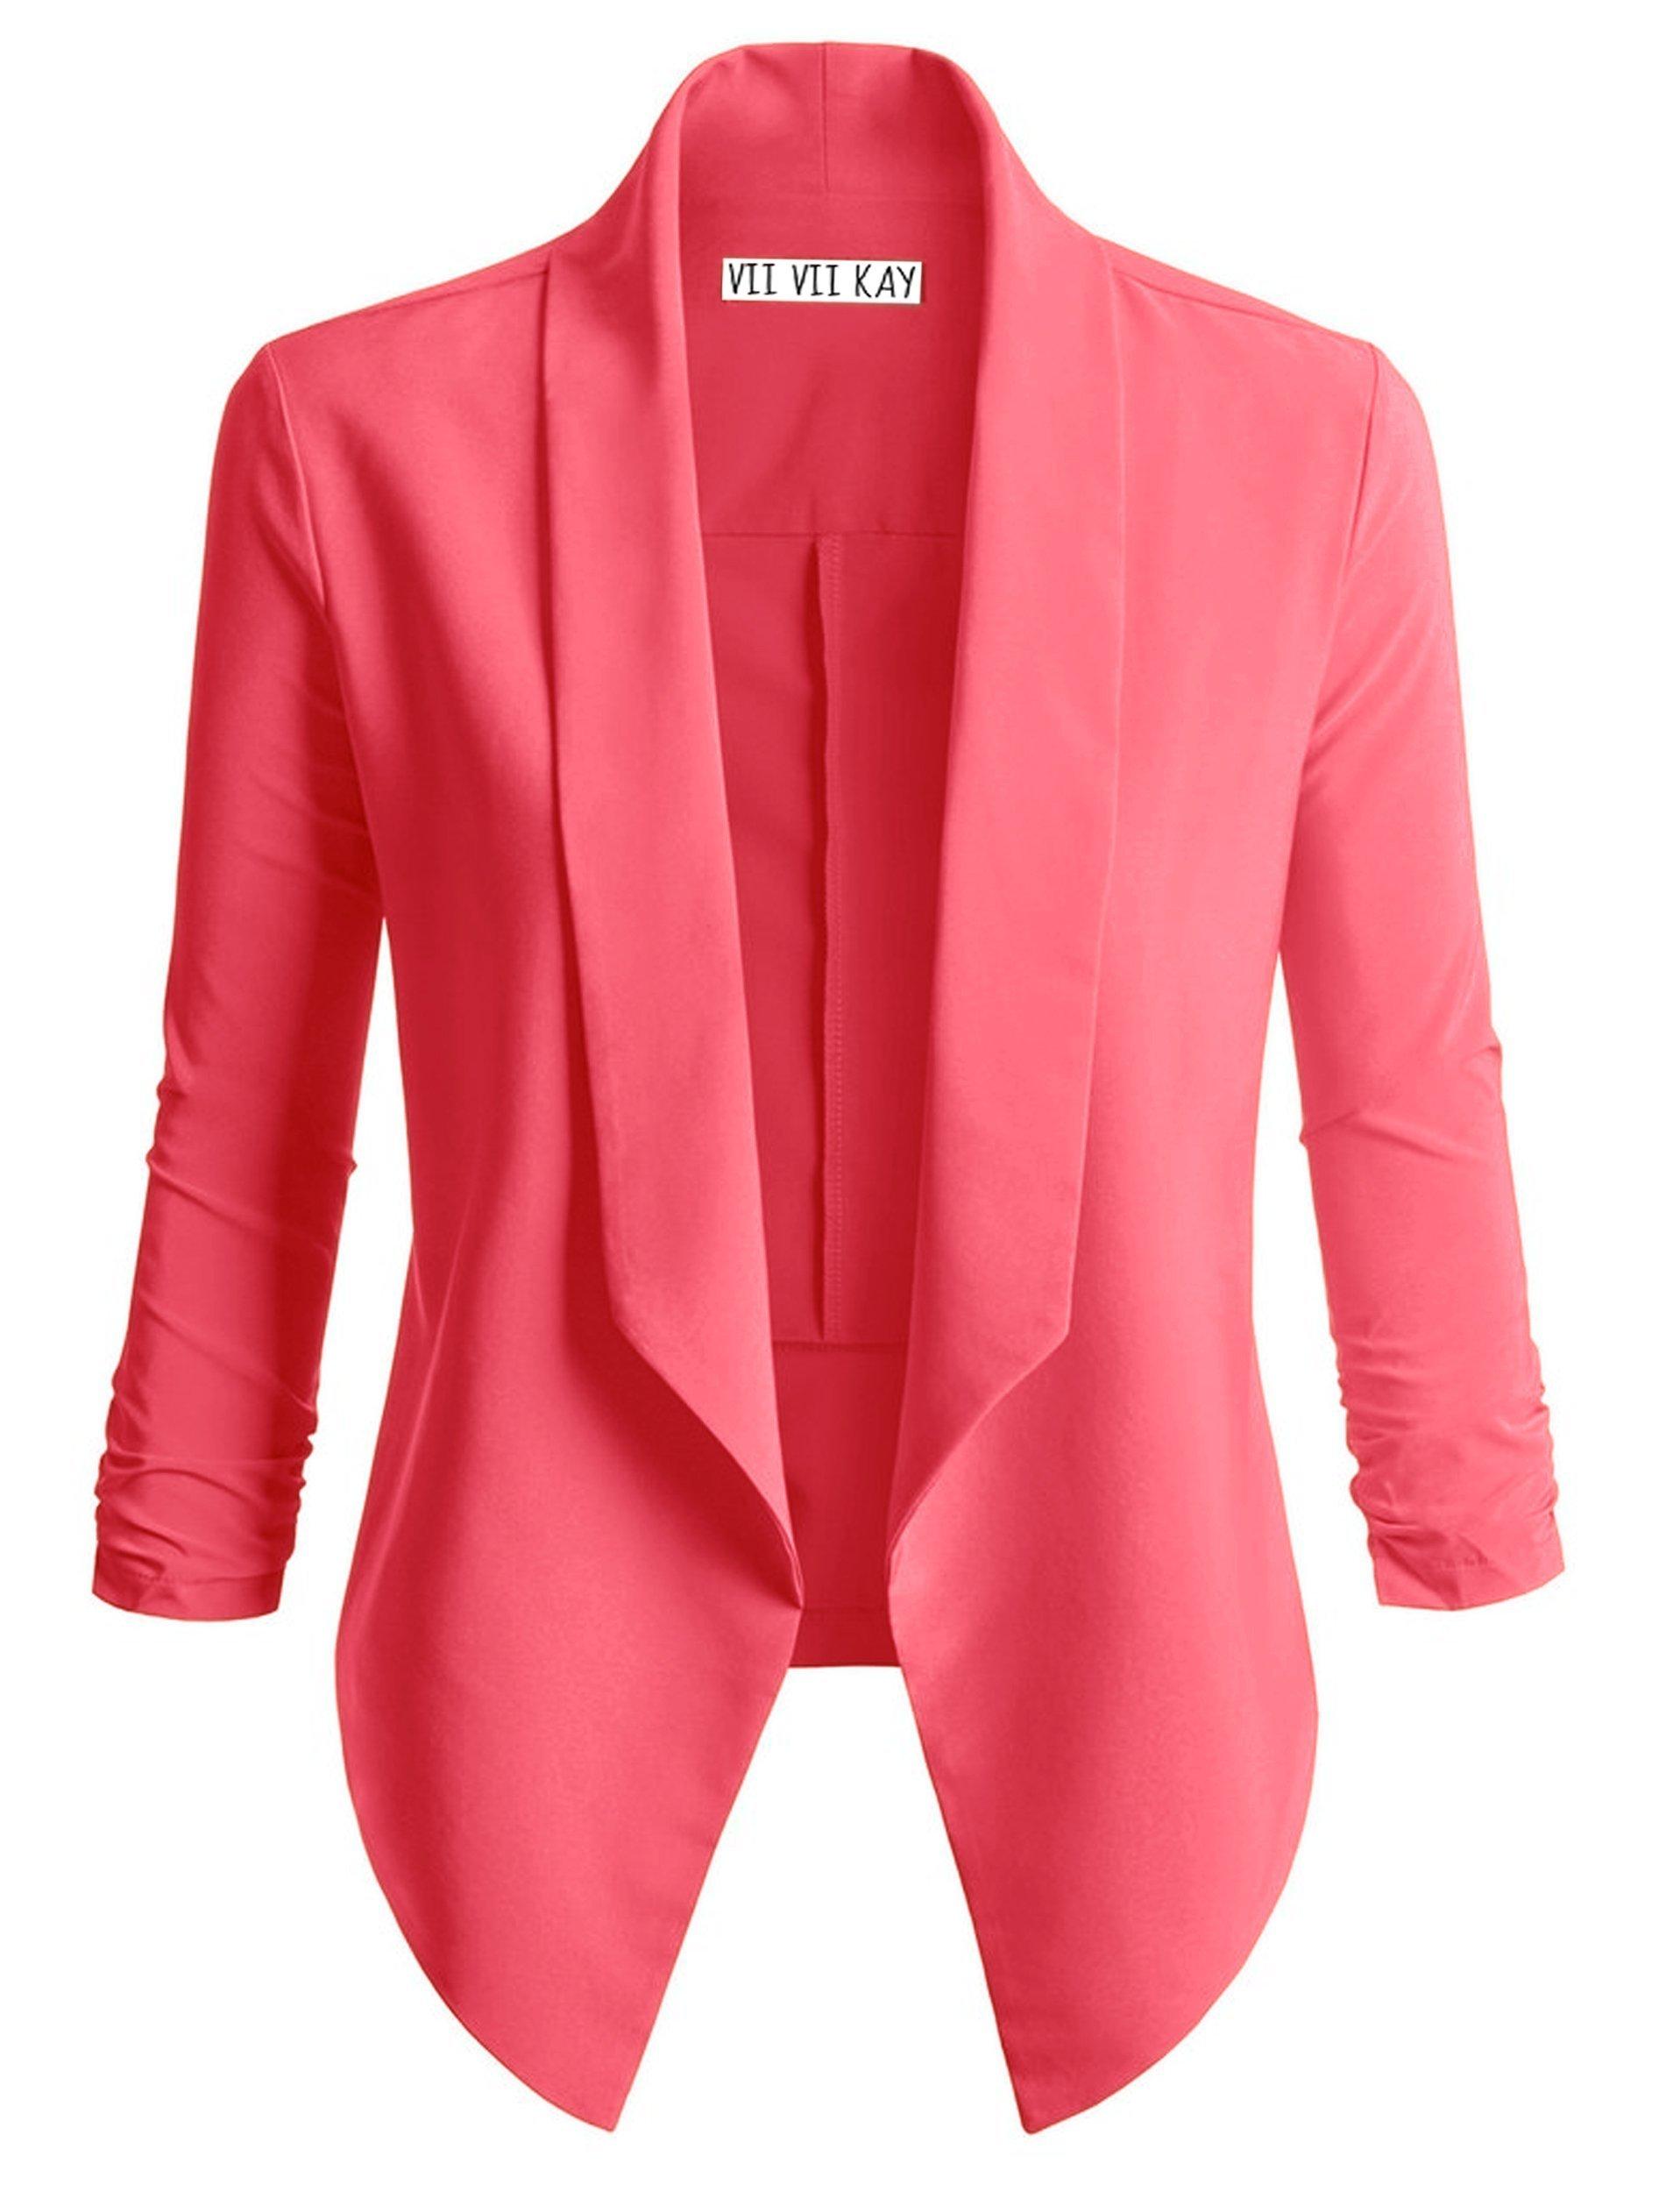 ViiViiKay Women's Versatile Business Attire Blazers In Multiple Styles 37_Coral 2XL